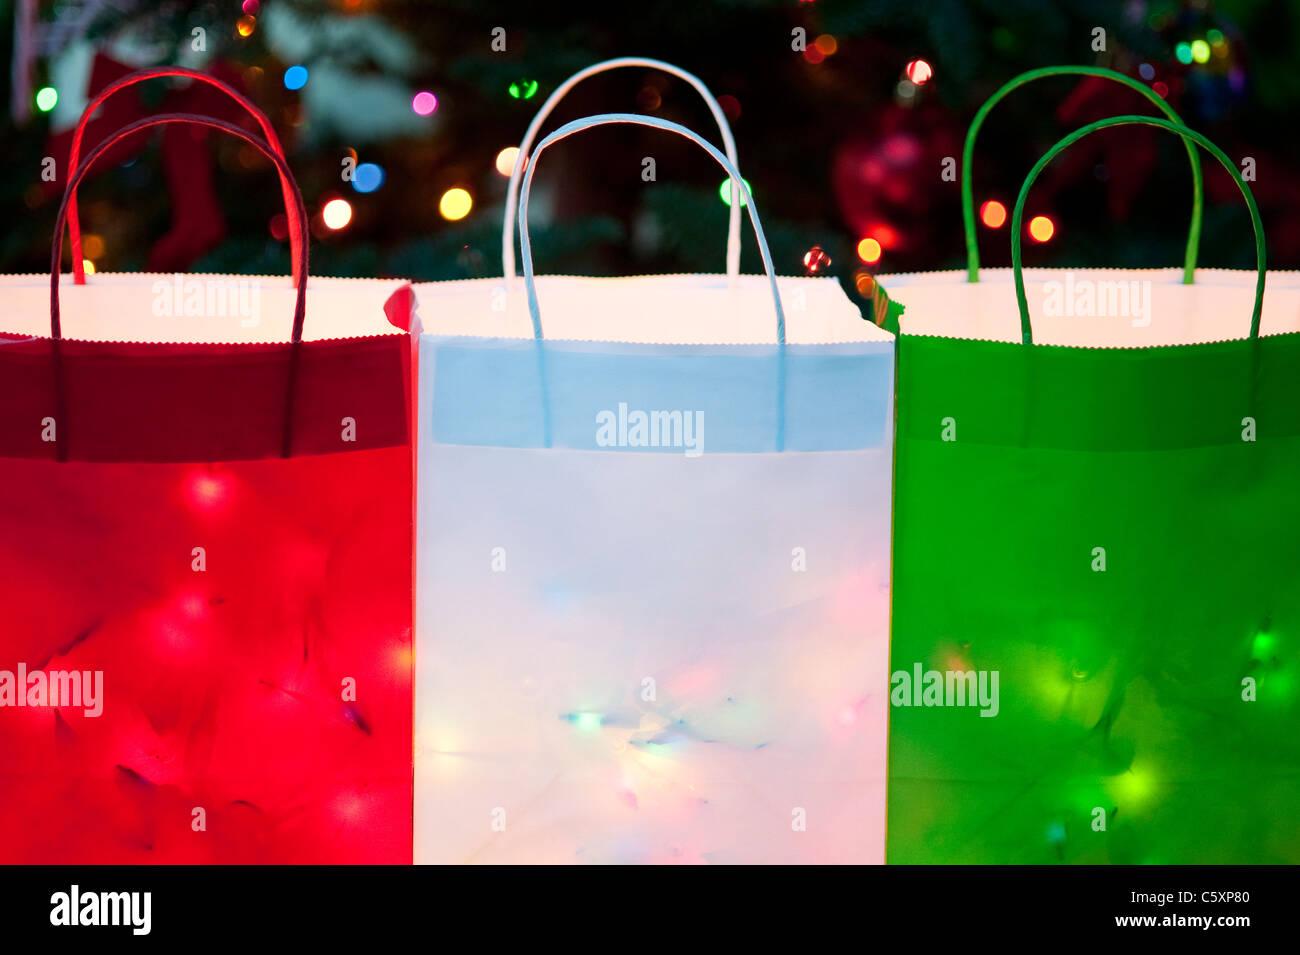 Colorful Christmas bags filled with Christmas Lights - Stock Image